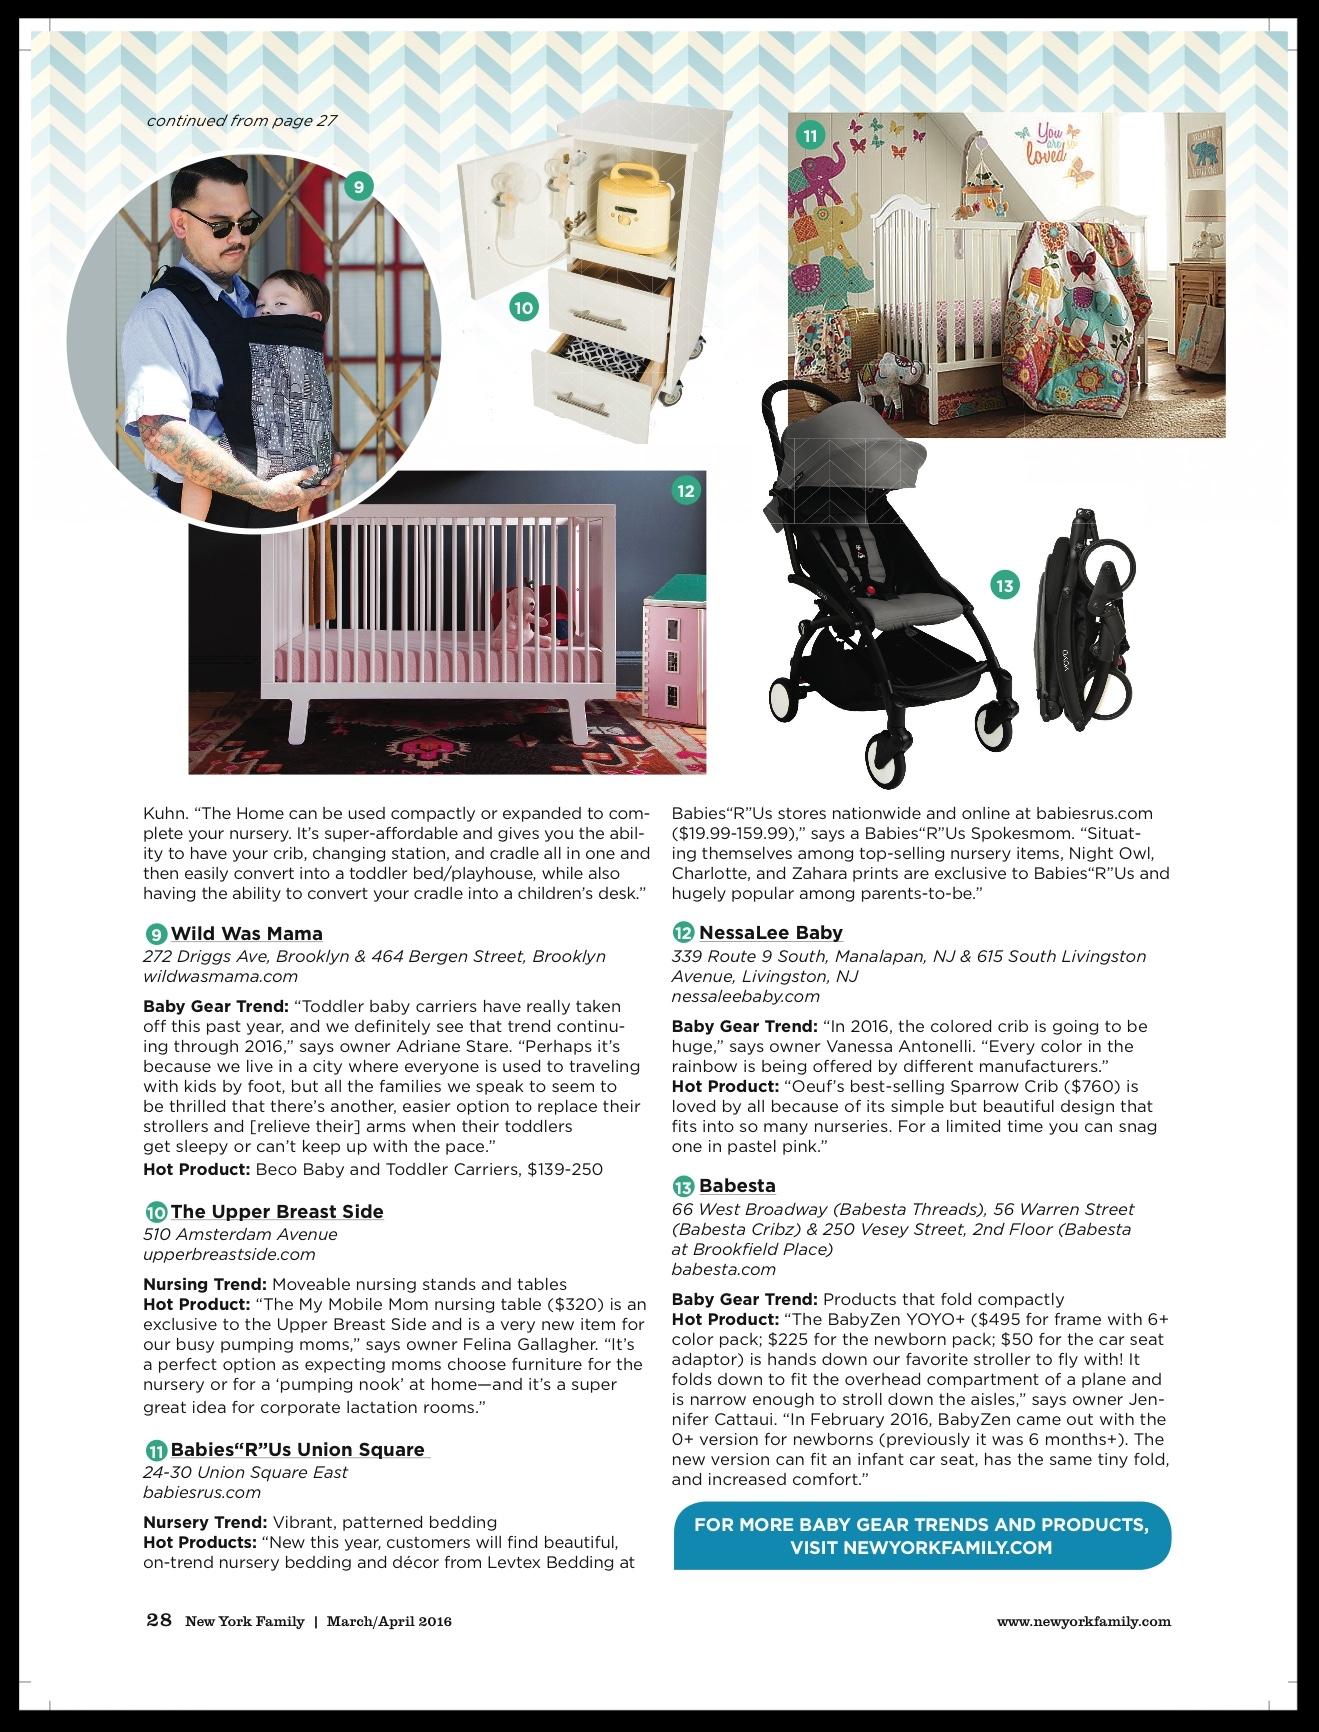 New York Family Magazine - Best in Baby..Favorite Trends and Products newyorkfamilymagazine.com